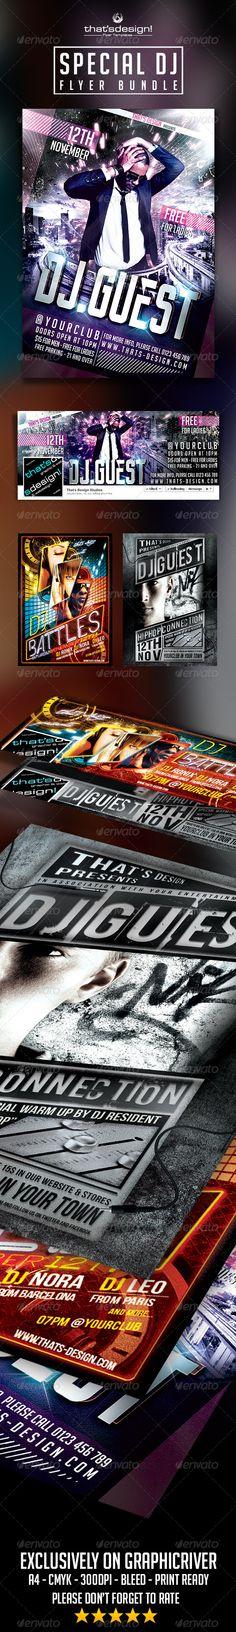 Special Dj Flyer Bundle Official website : http://thats-design.com/